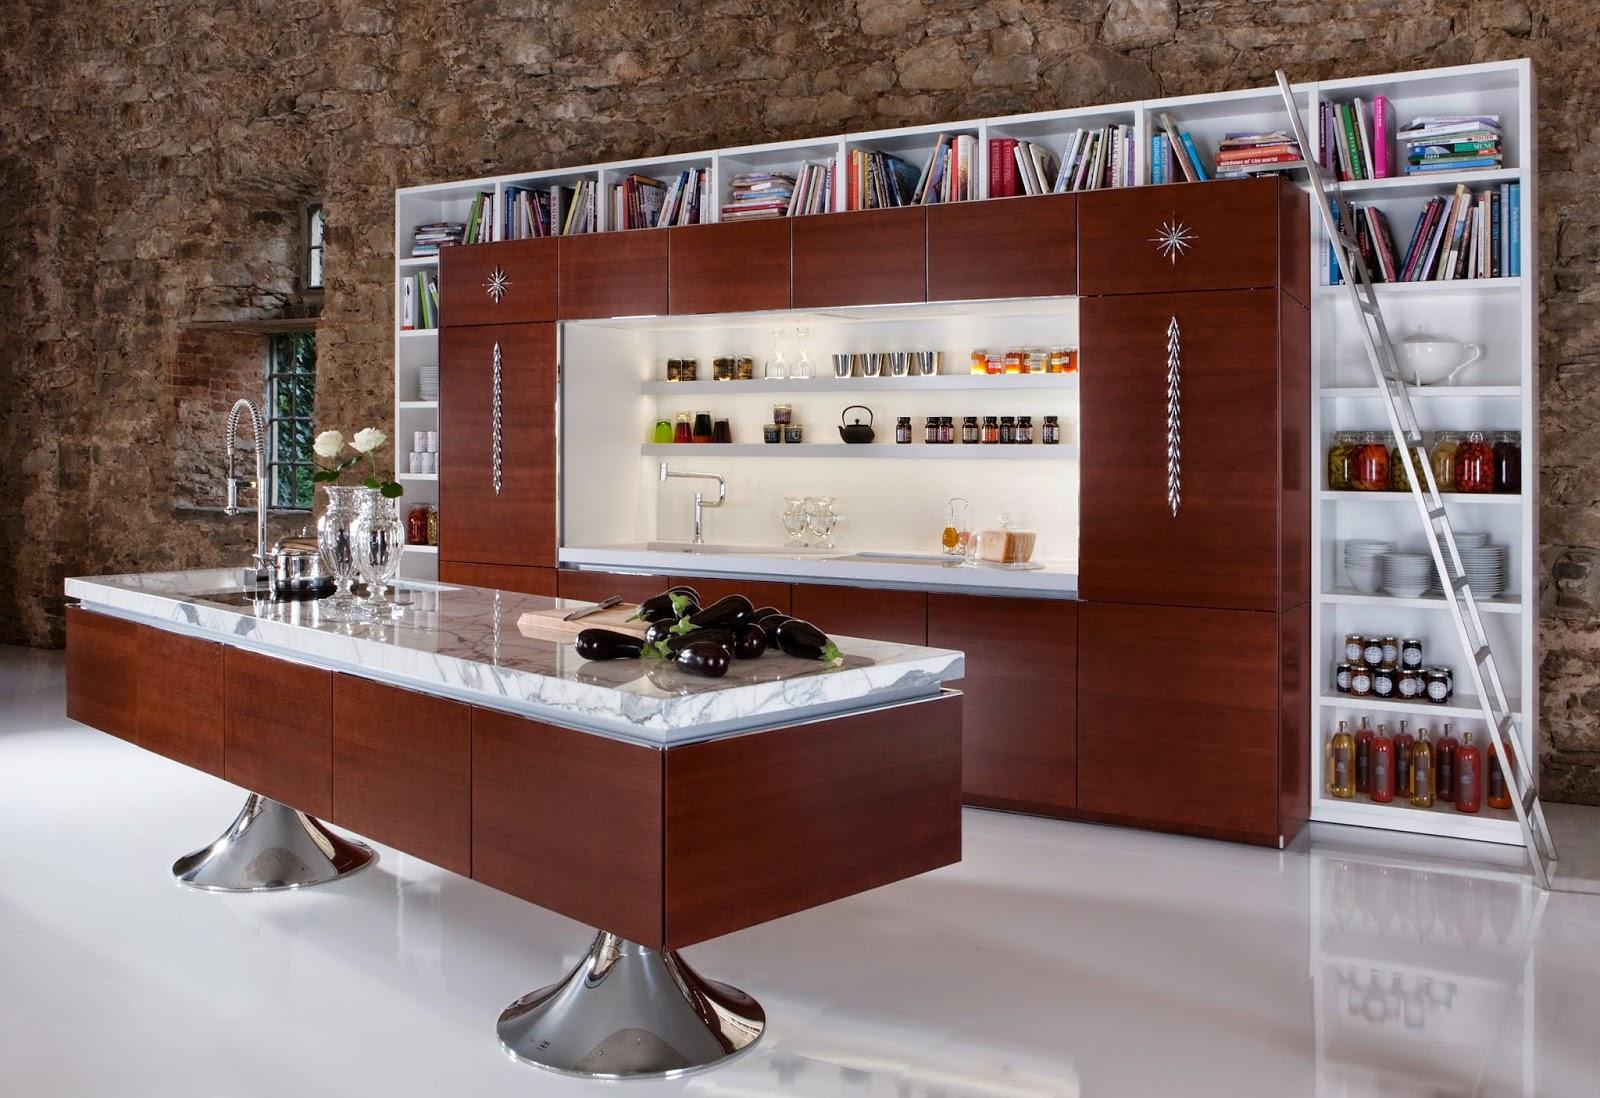 Starck 39 in blog starck cuisine starck by warendorf for Classic contemporary kitchen design ideas